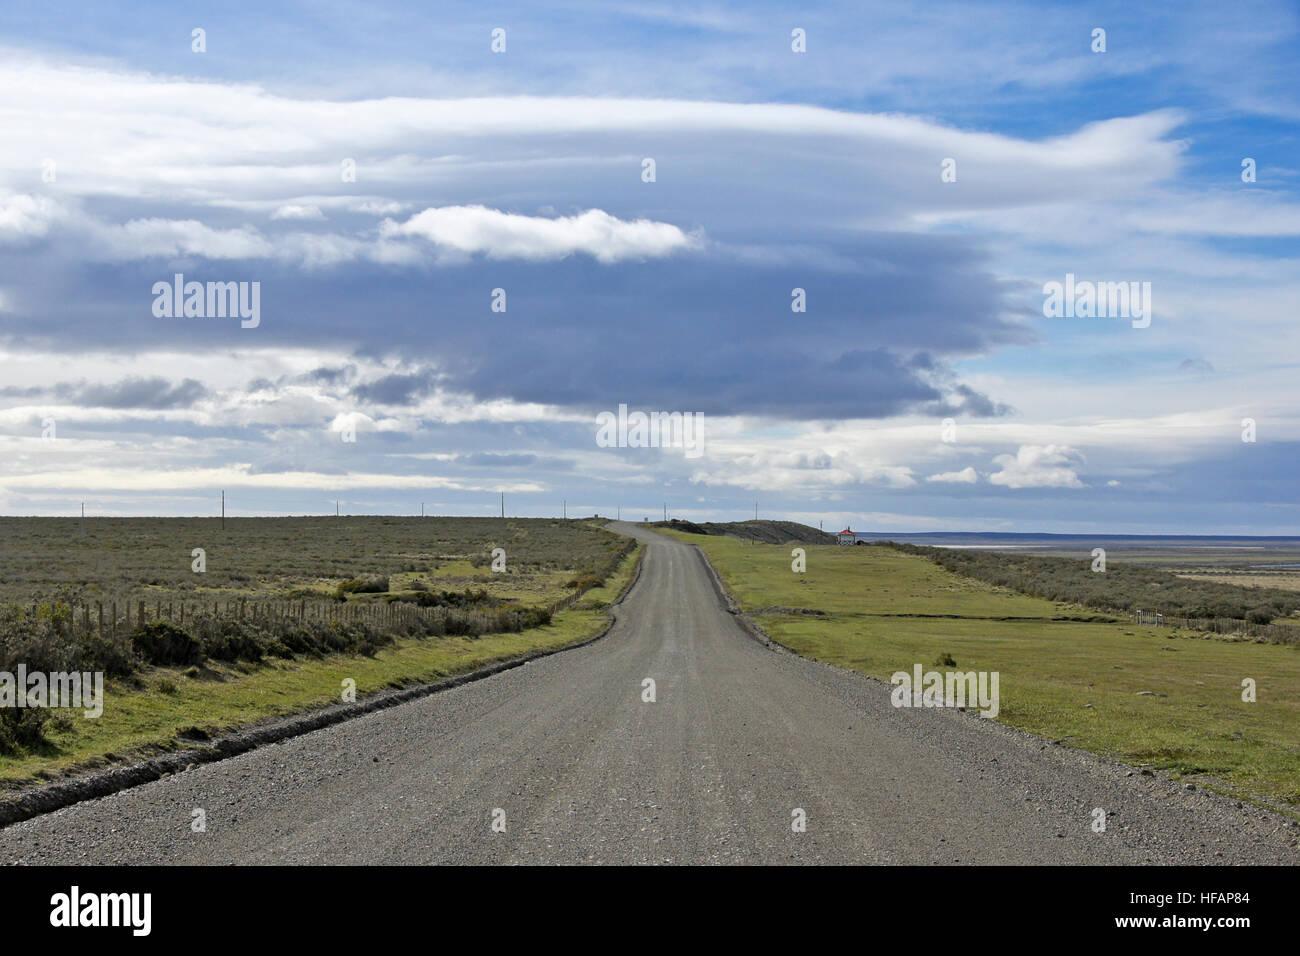 Ruta Aonikenk north of Punta Arenas, Patagonia, Chile - Stock Image